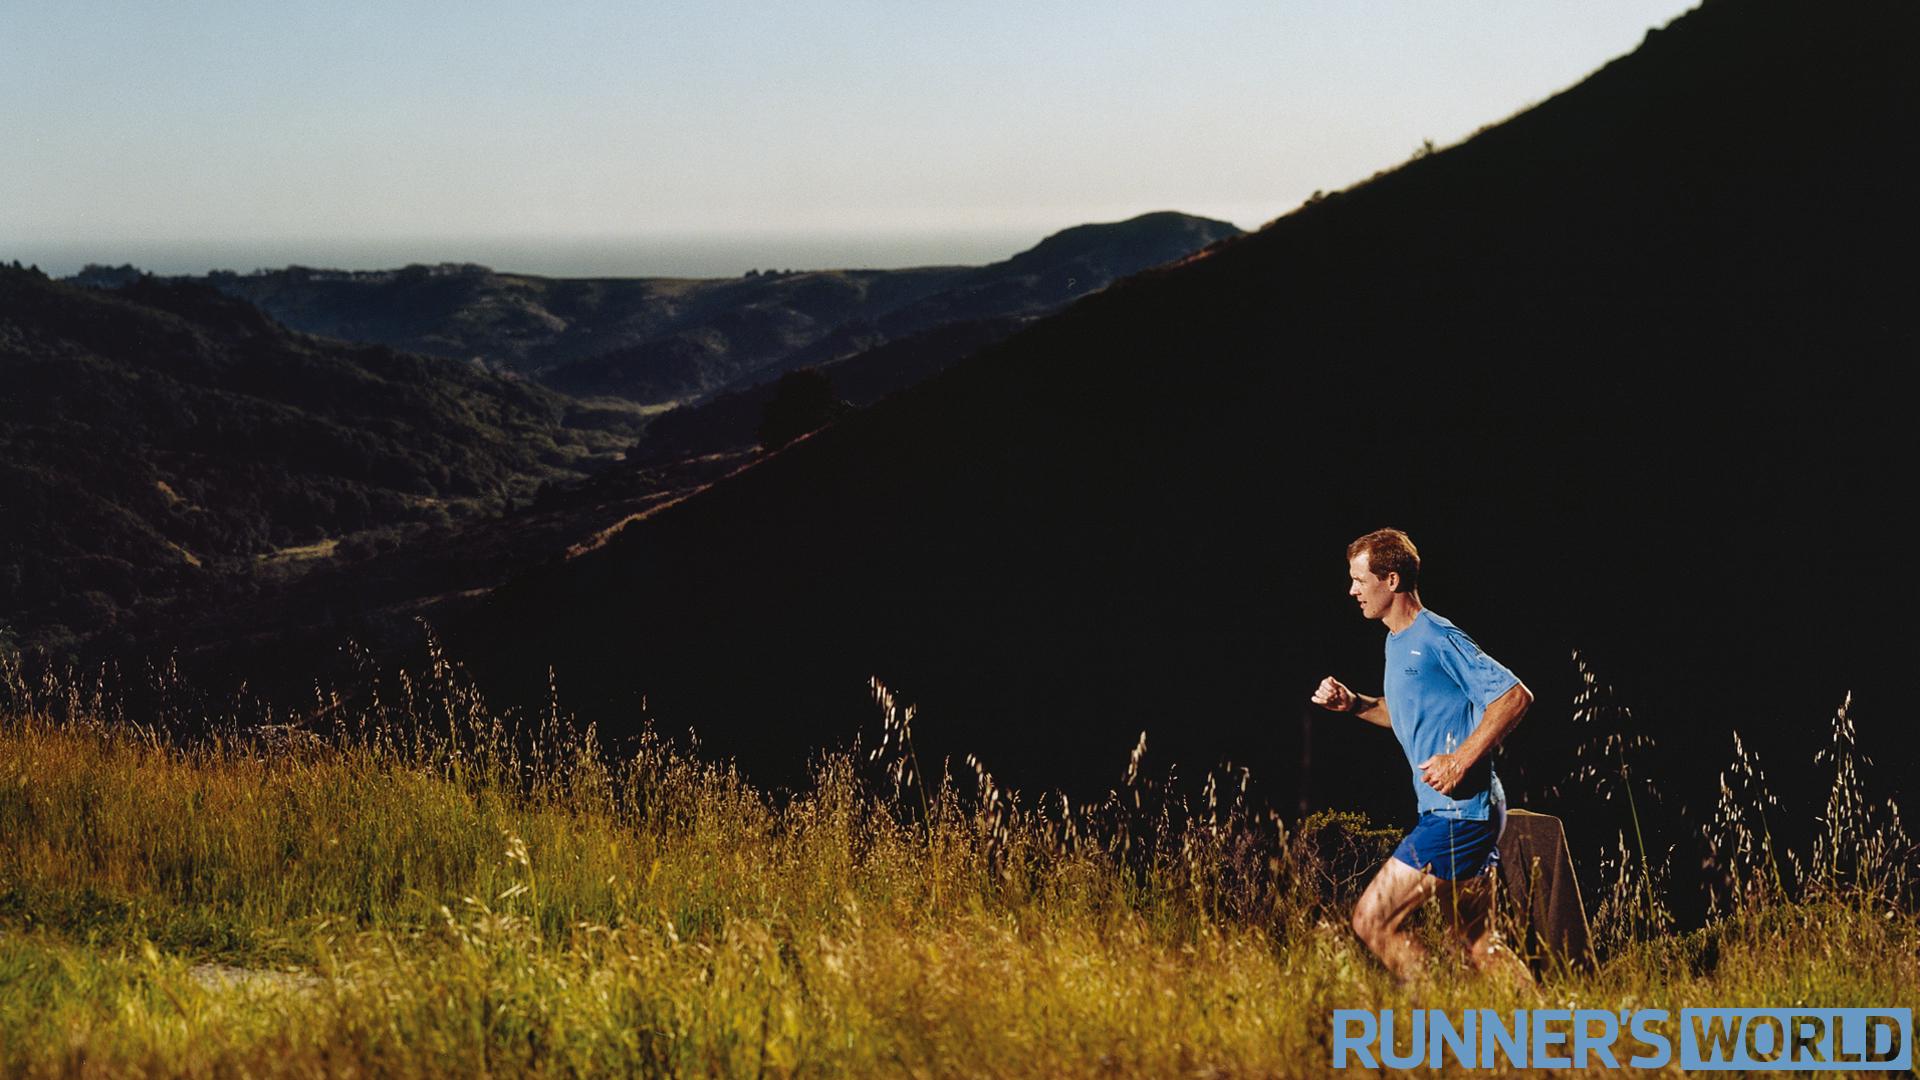 runners world rave run wallpaper wallpapersafari